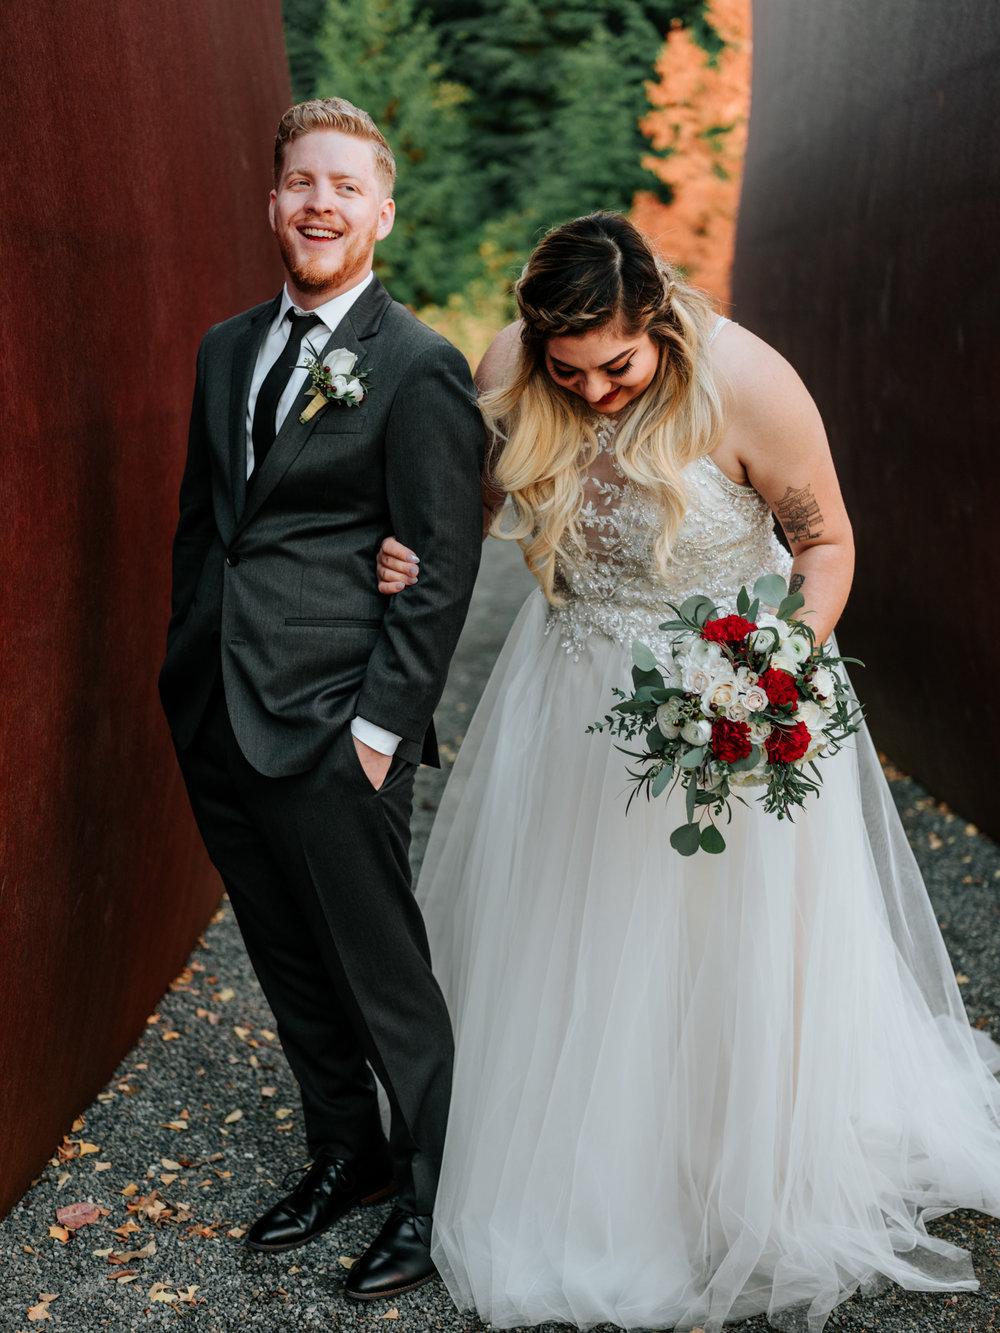 Stolen Glimpses Seattle Wedding Photographers 33.jpg